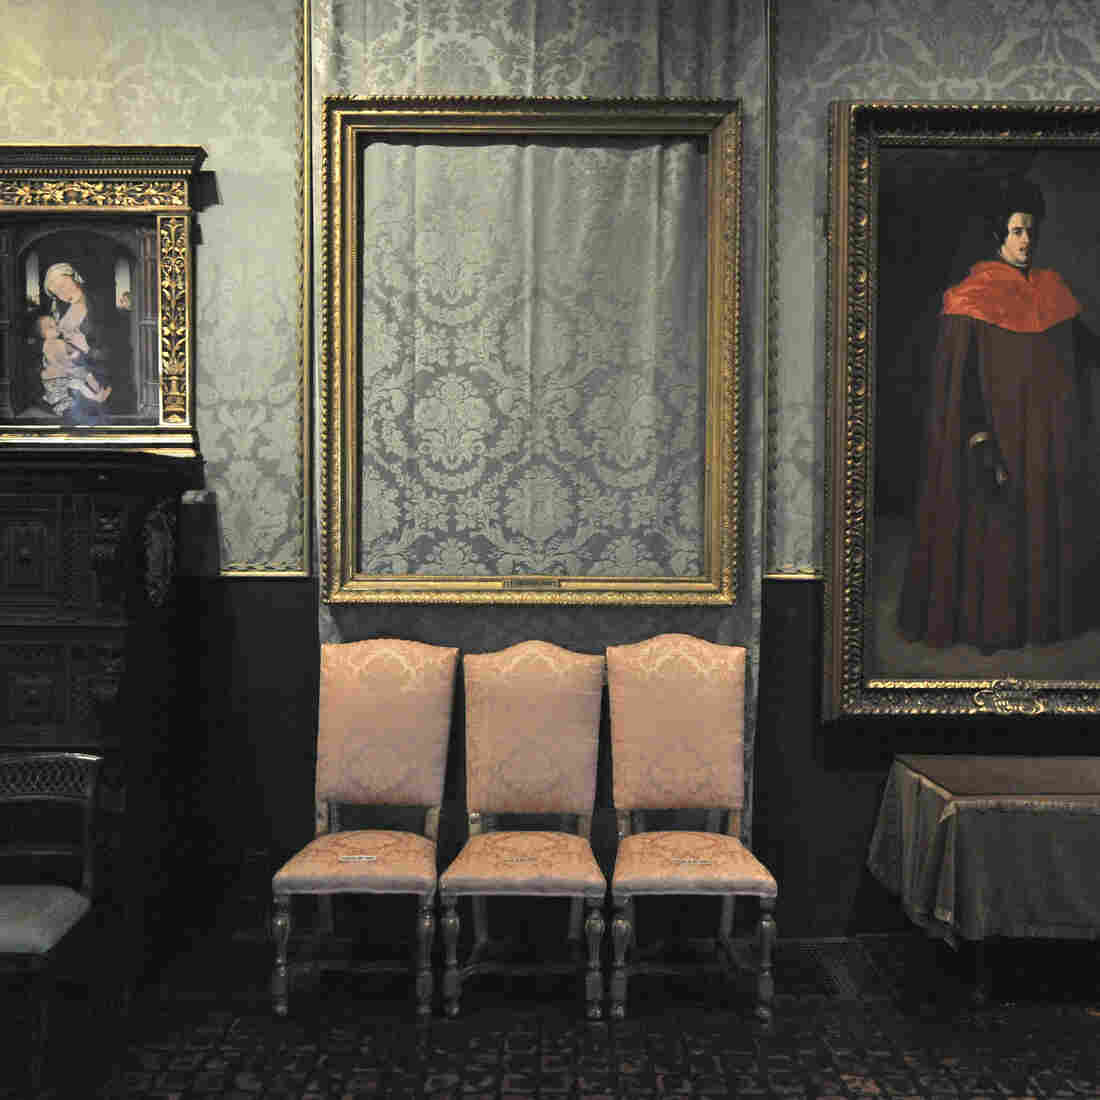 25 Years After Art Heist, Empty Frames Still Hang In Boston's Gardner Museum